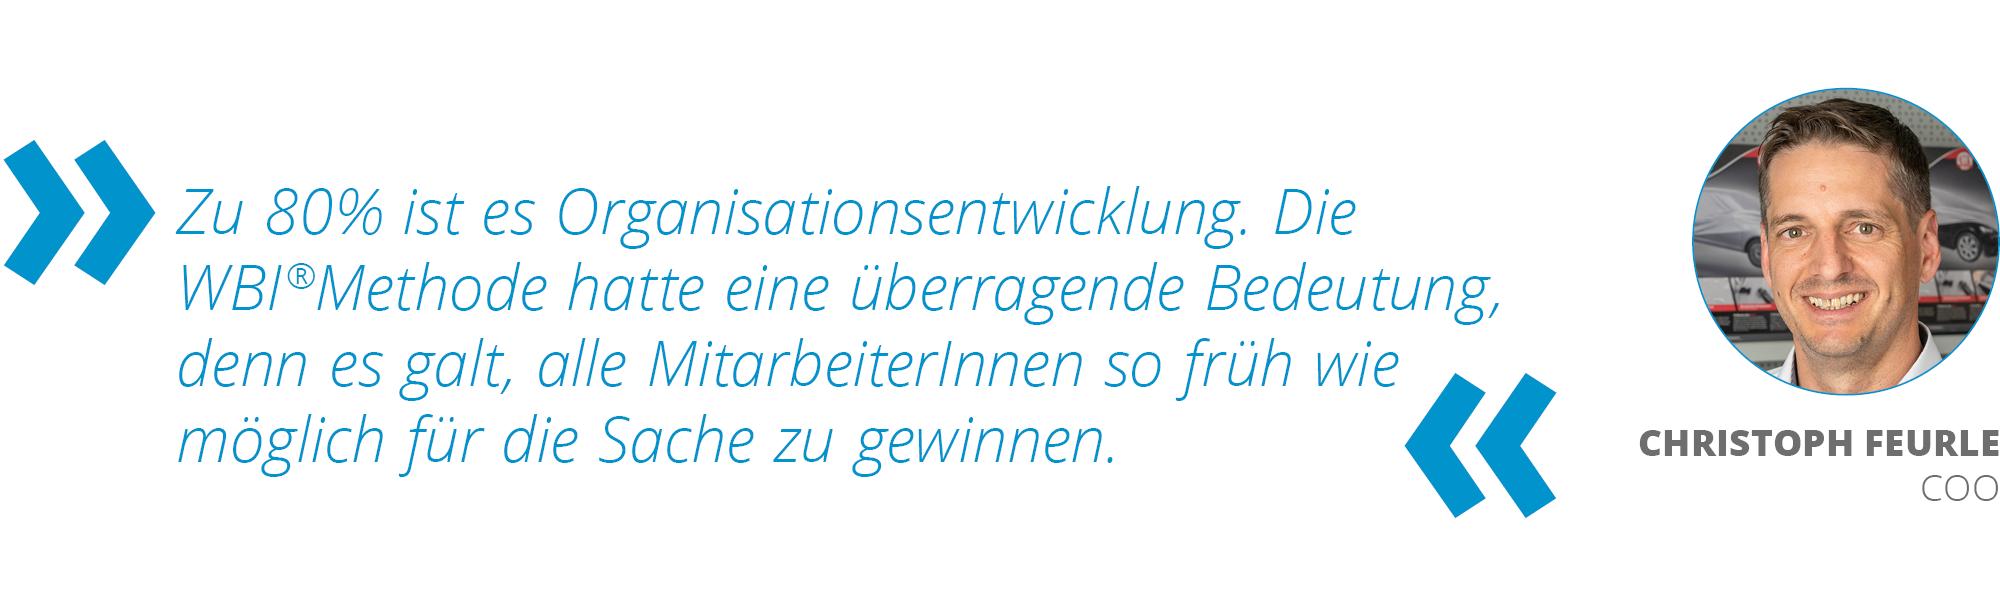 Zitat-Christoph-Feurle